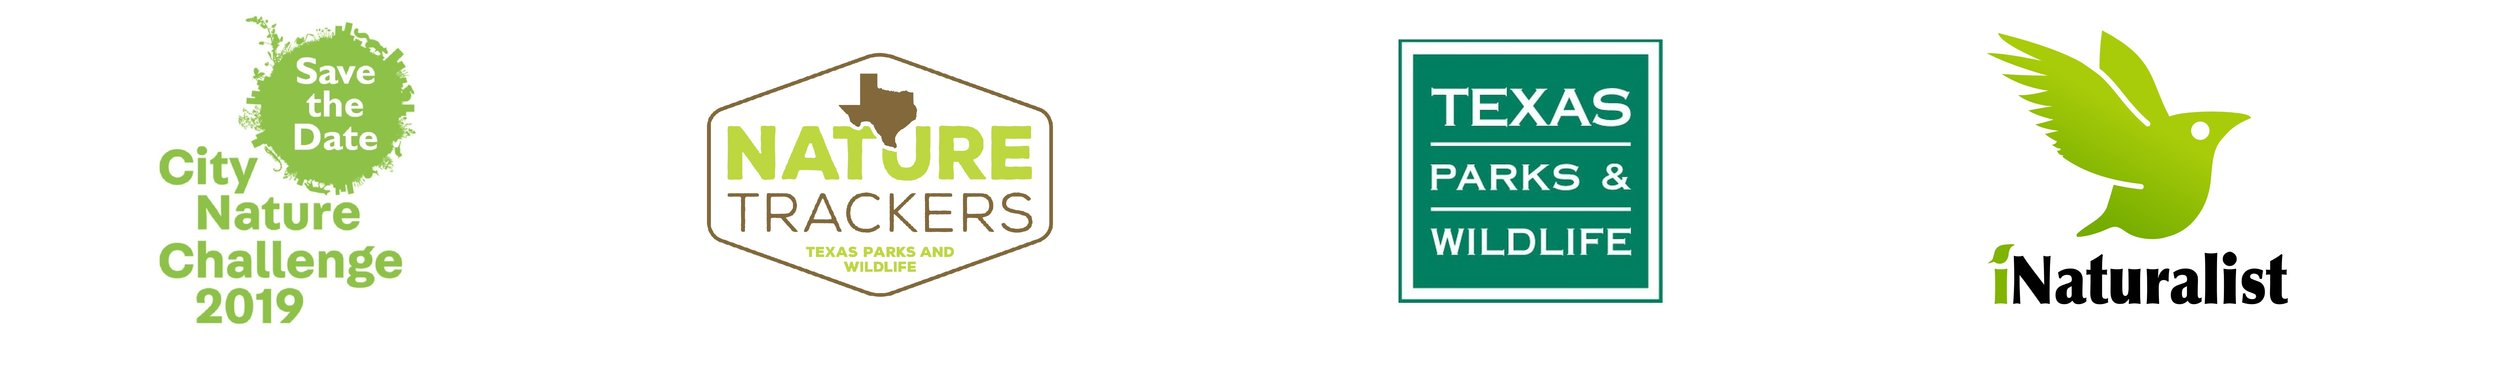 2019 city nature challenge logos.JPG